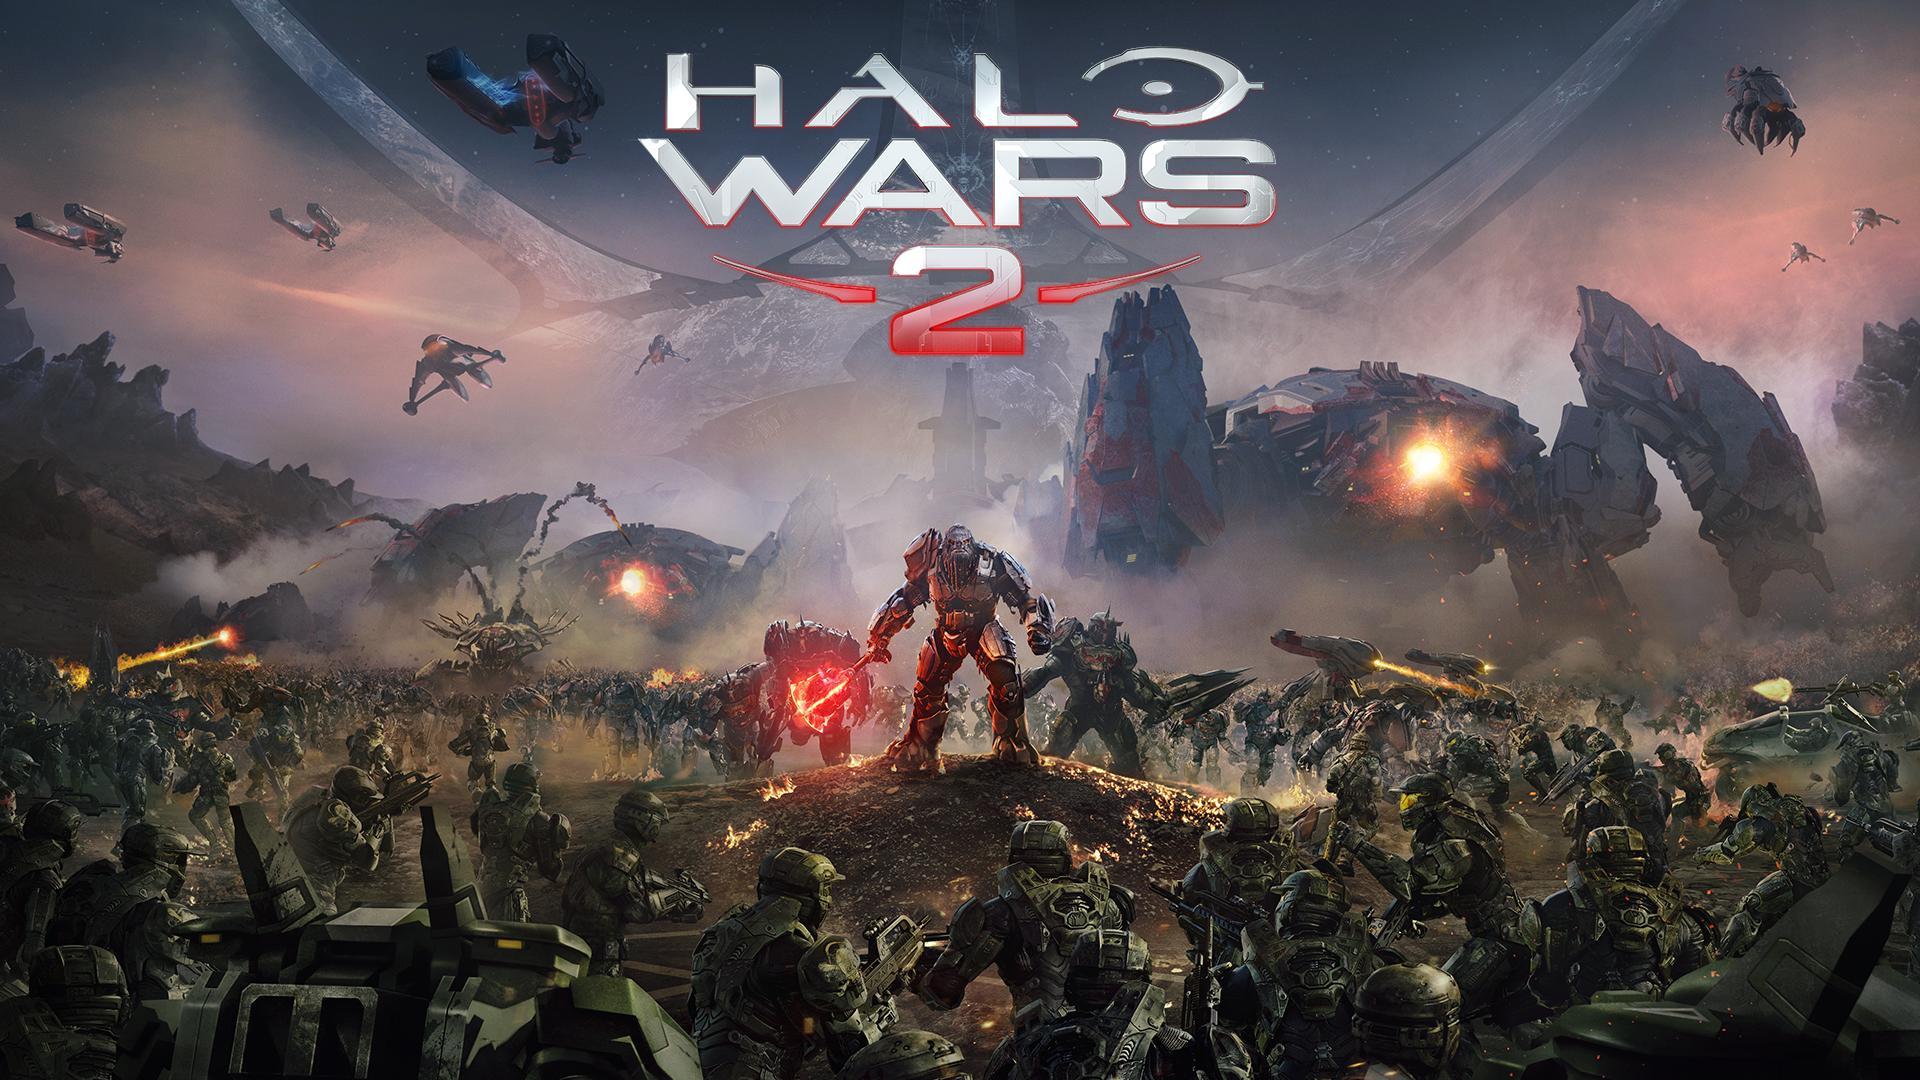 Rumor: Halo Wars 2 Open Beta Coming Next Week